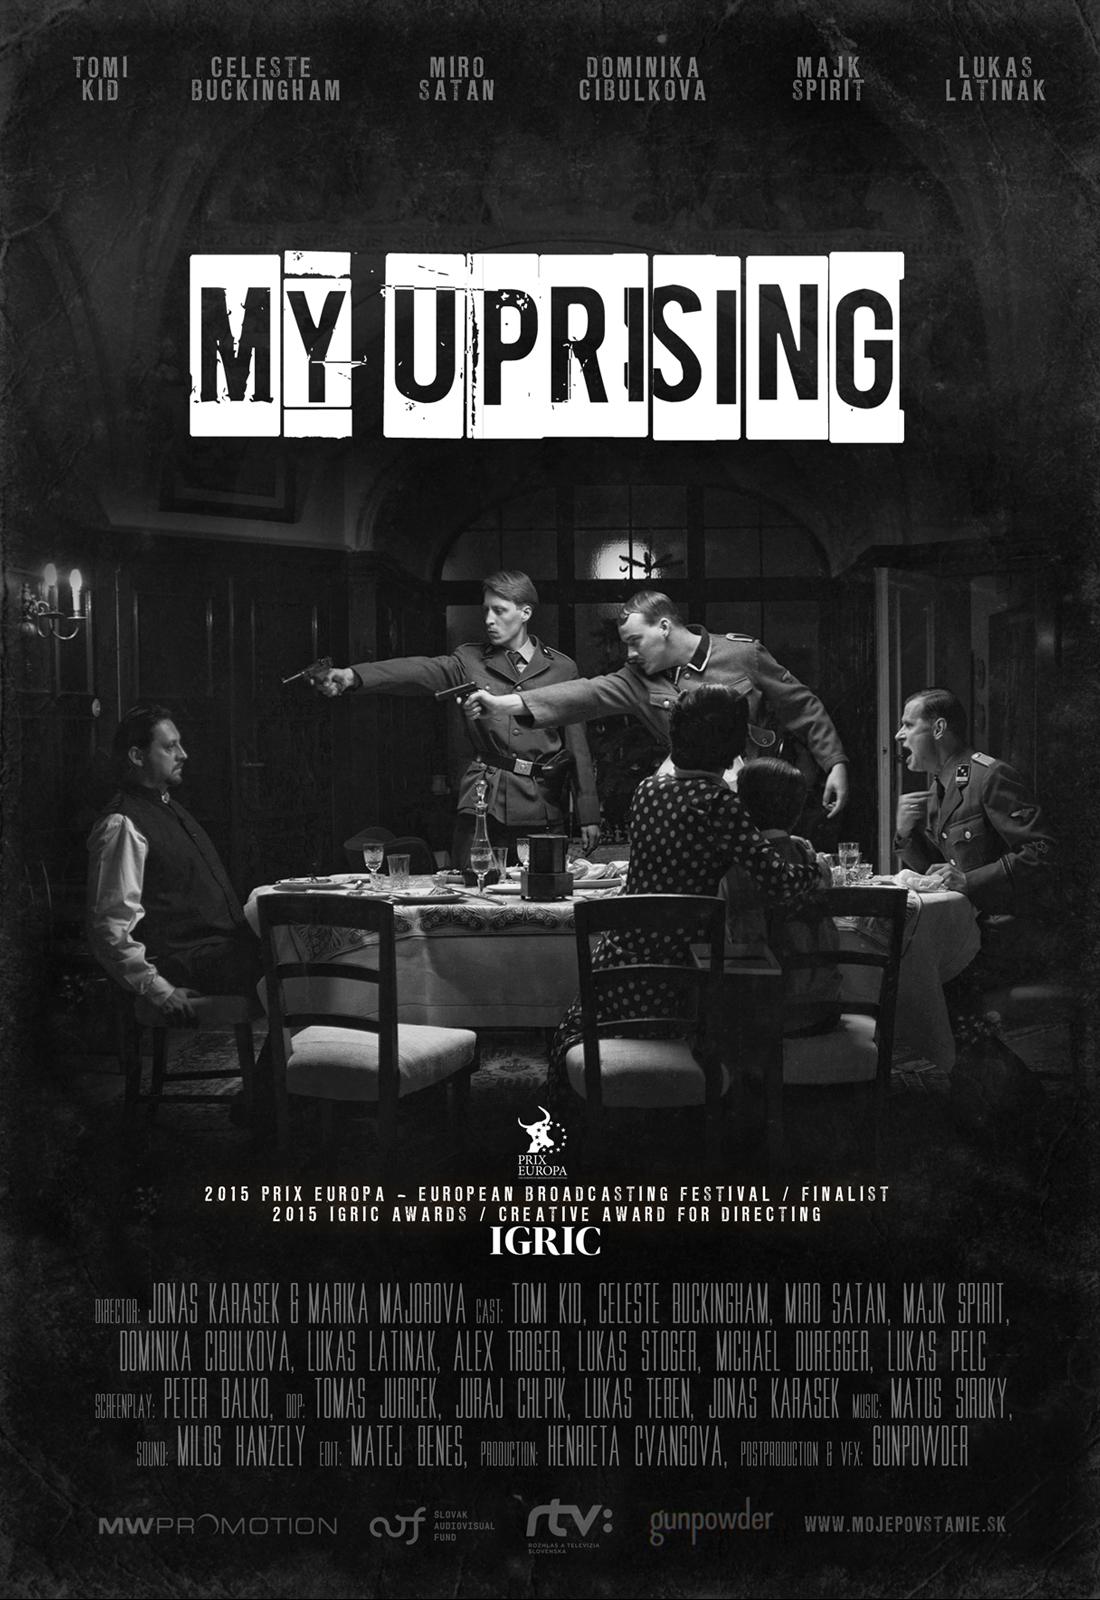 My Uprising